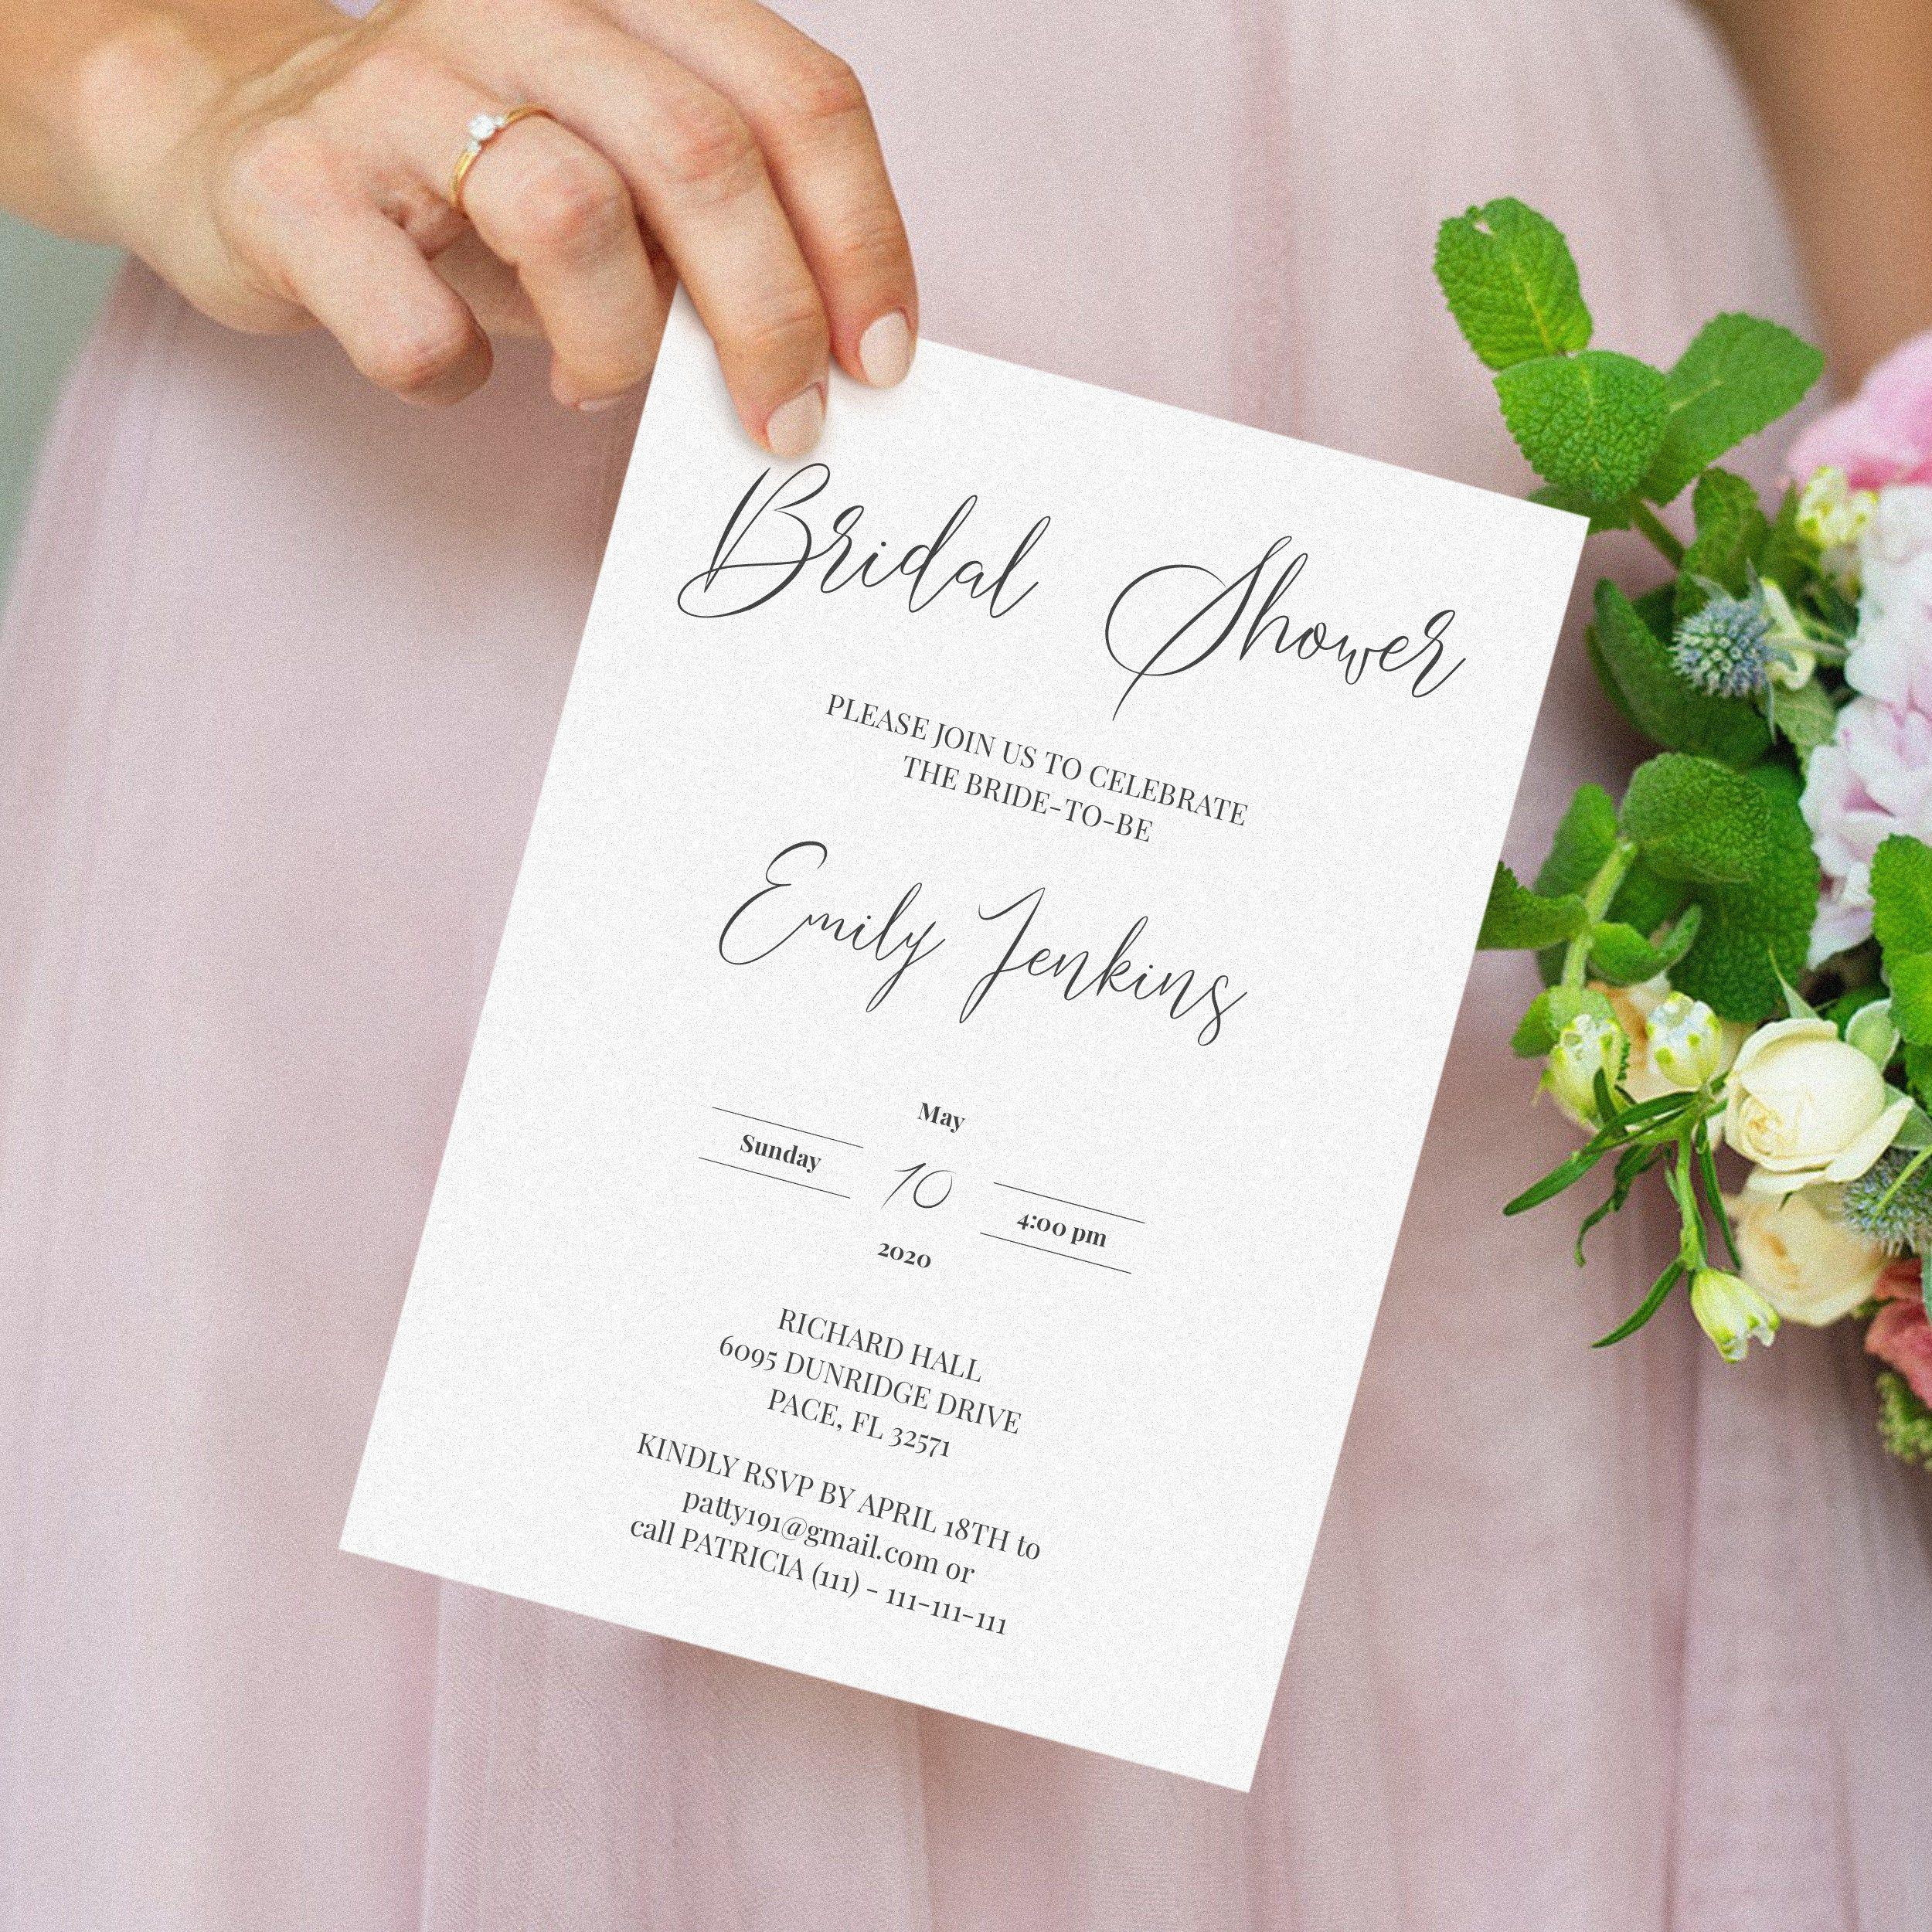 Bridal Shower Invite Elegant Bridal Shower Invitation Etsy In 2020 Wedding Invitations Printable Templates Diy Wedding Invitations Templates Bridal Shower Invitations Templates